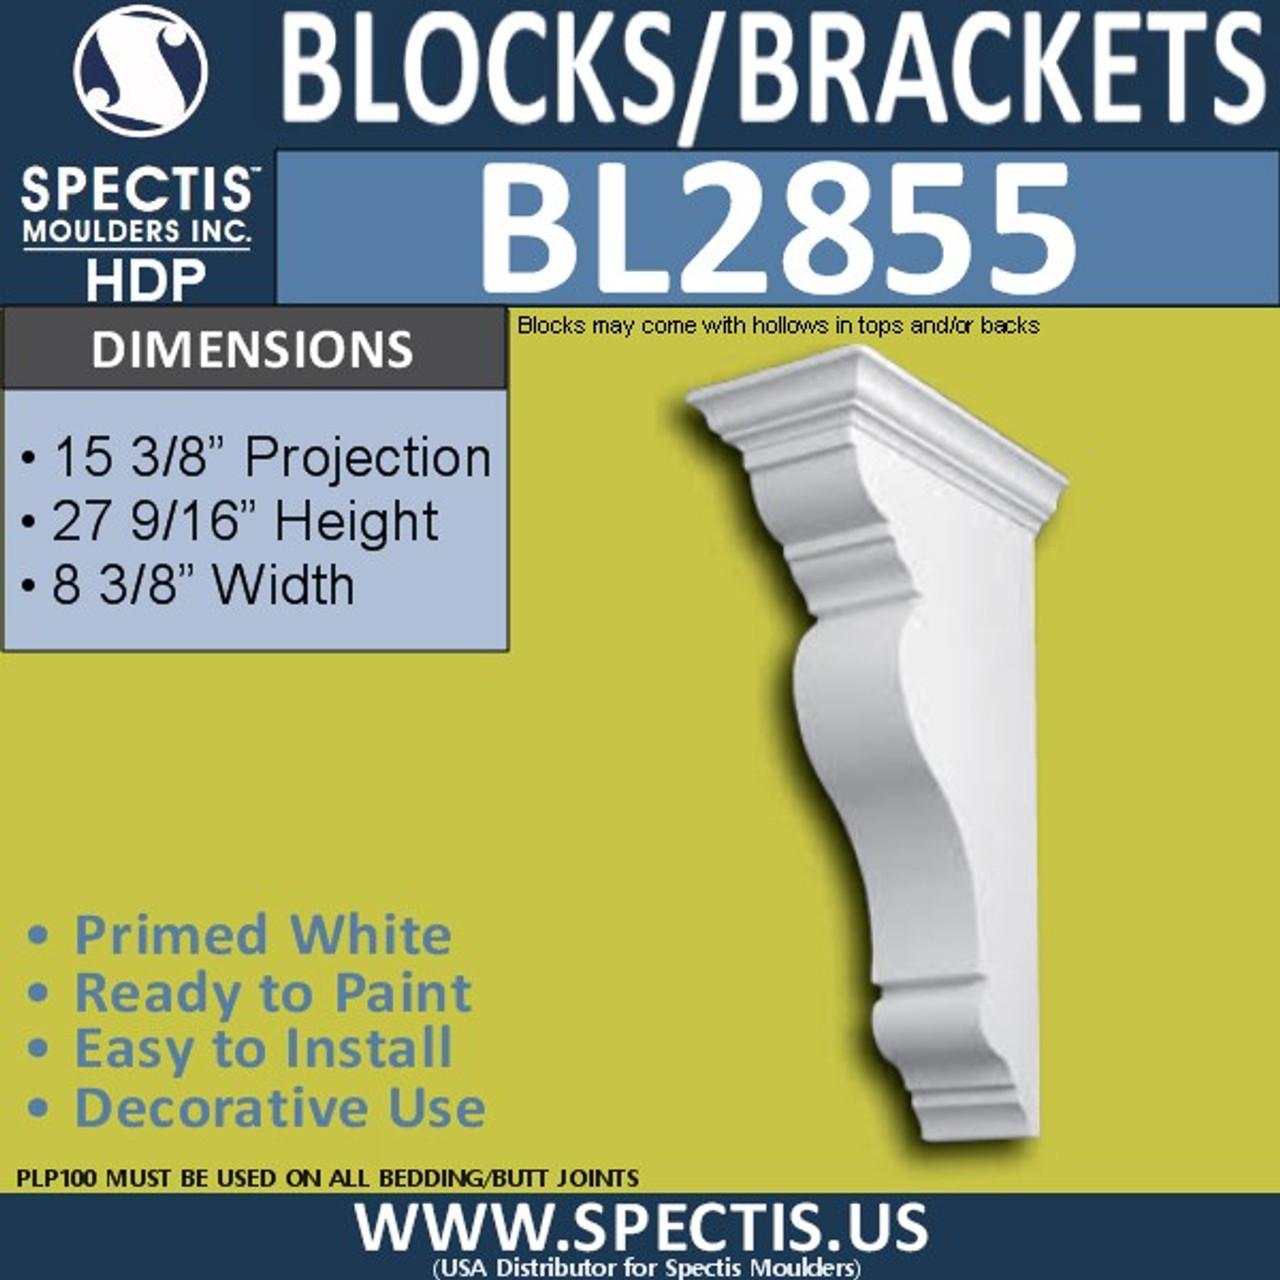 "BL2855 Eave Block or Bracket 8.3""W x 27.5""H x 15.5"" P"